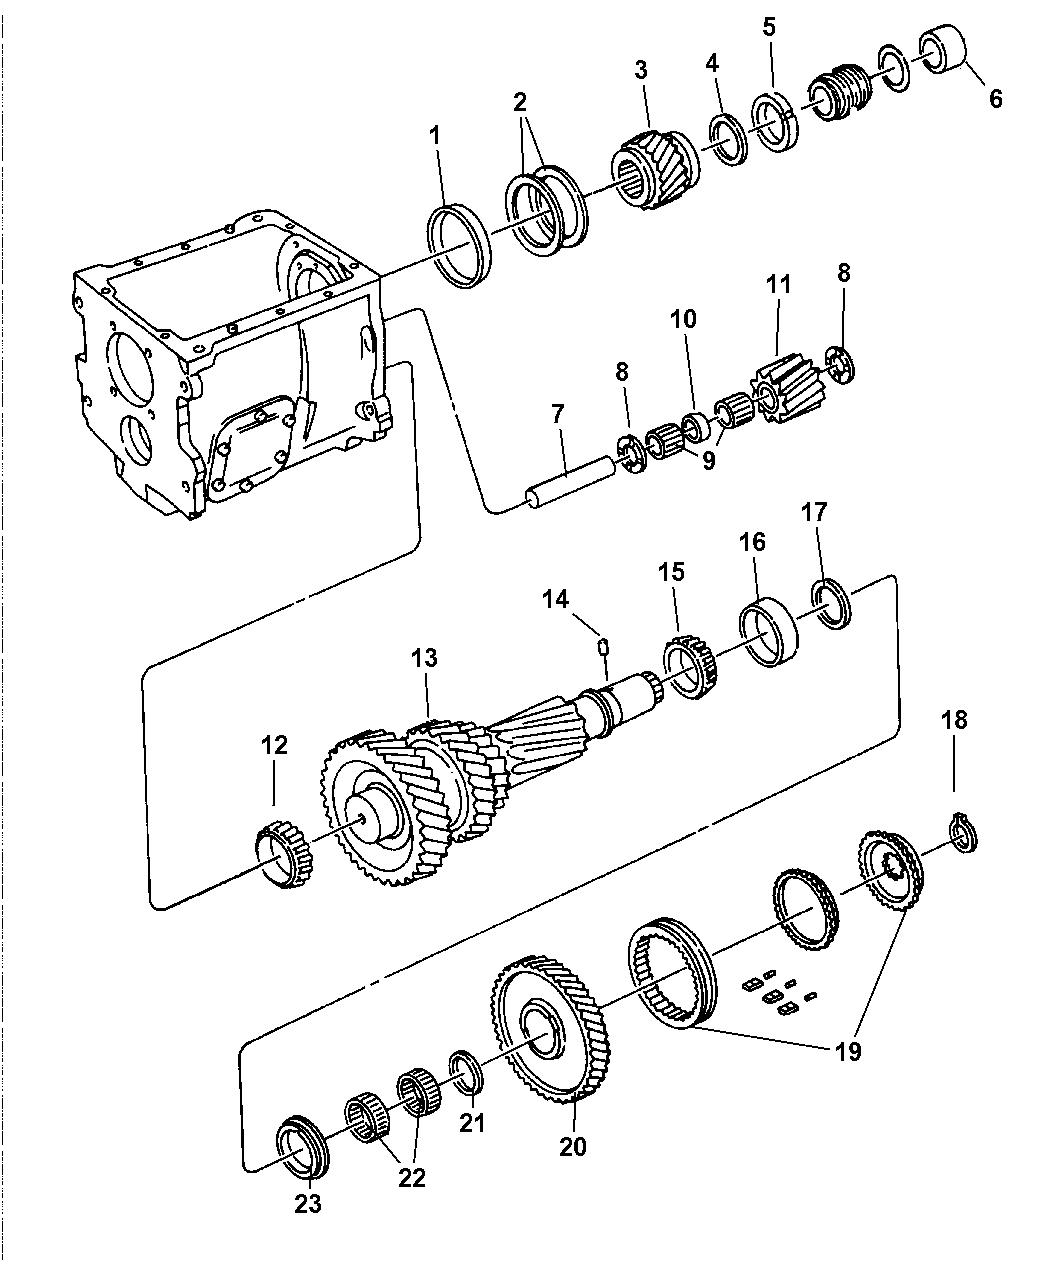 1997 Dodge Ram 3500 Gear Train - Thumbnail 1